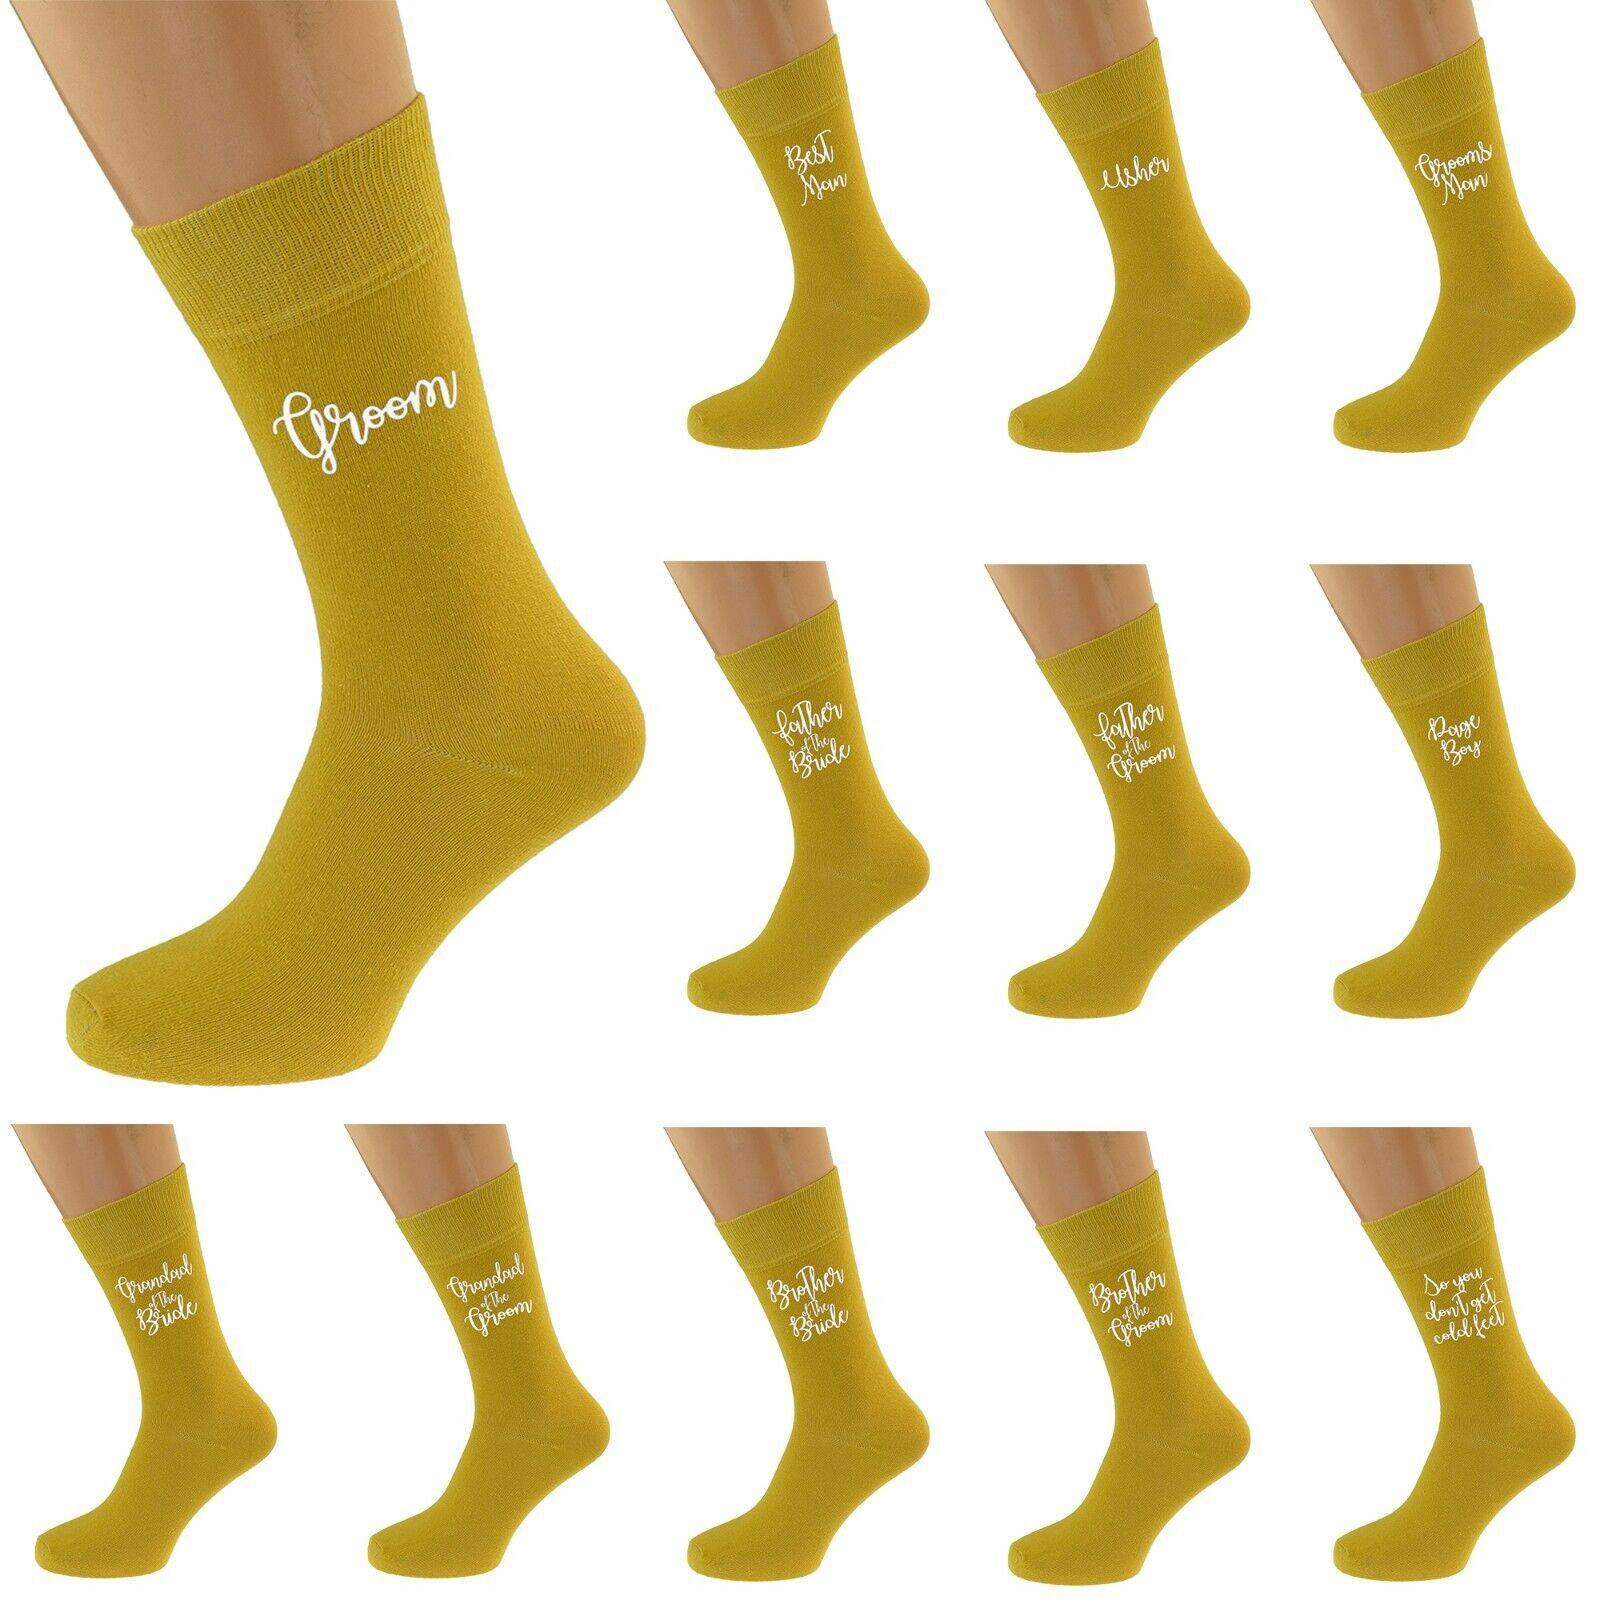 Mustard Wedding Script Design Socks UK Unisex 5-12 in Various Roles X6S239-N818